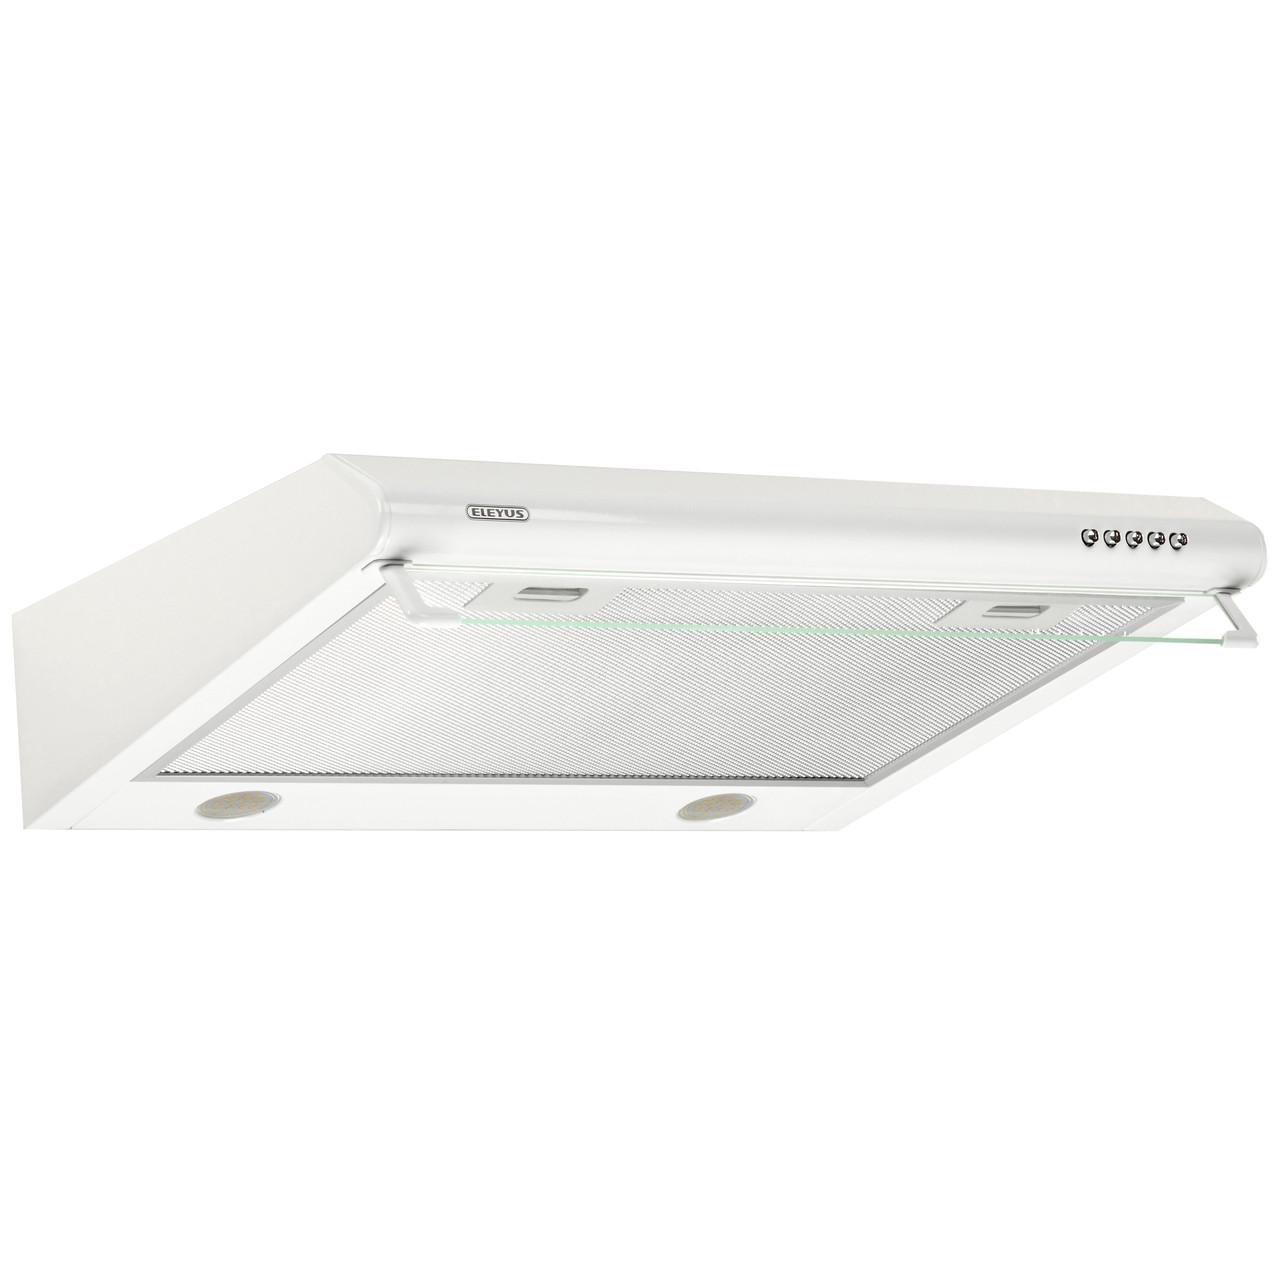 Витяжка кухонна ELEYUS BONA ІІ LED SMD 60 WH